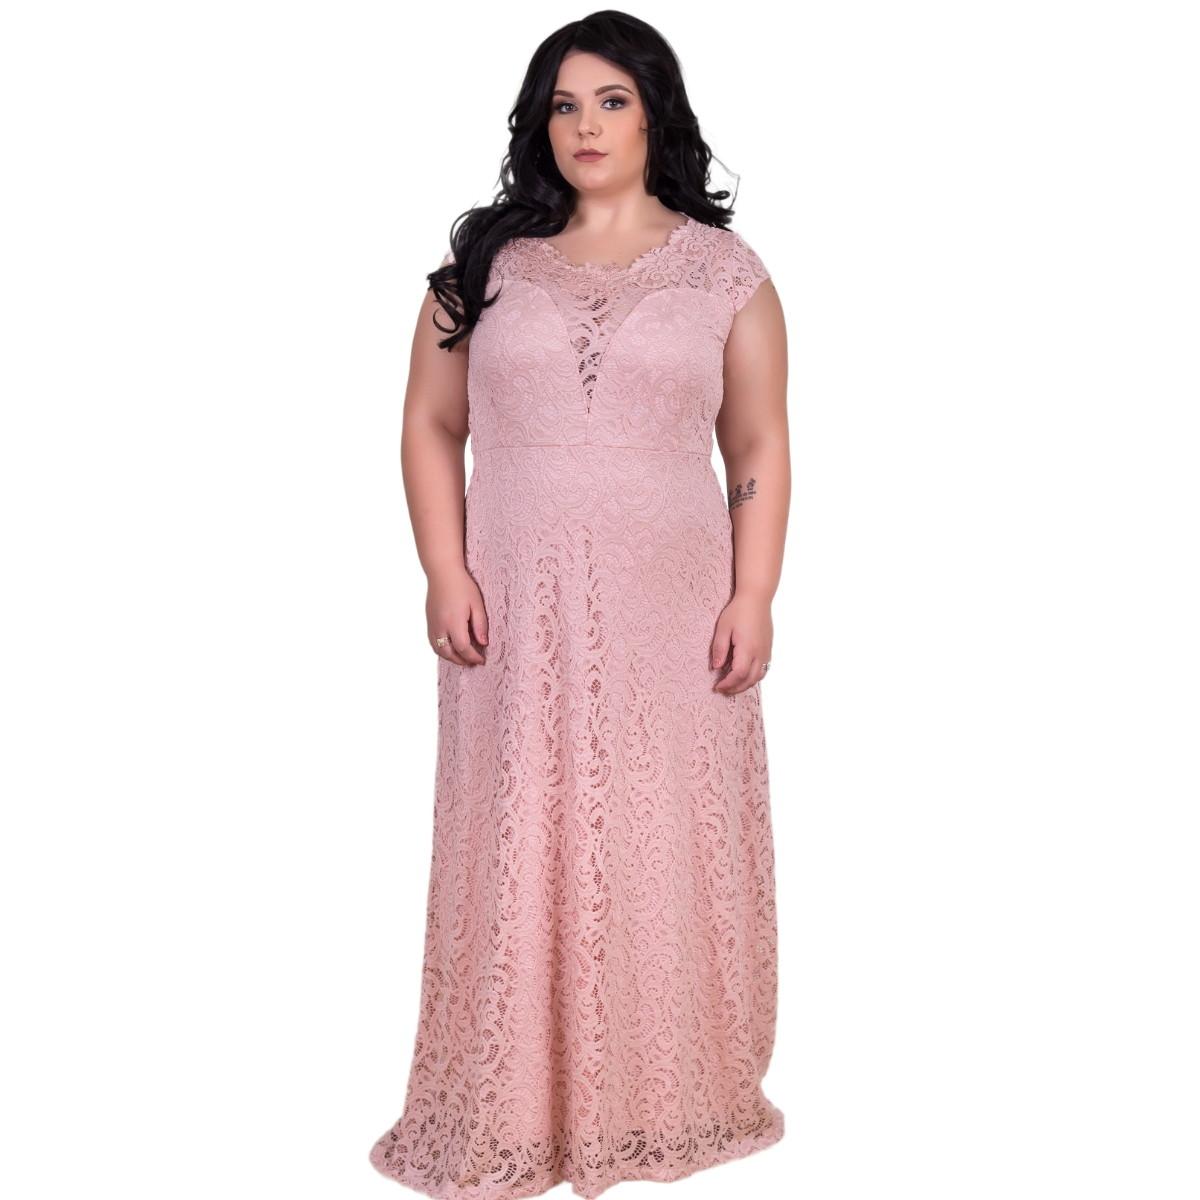 Vestido Noiva Plus Size Vestido Casamento Civil Sob Medida